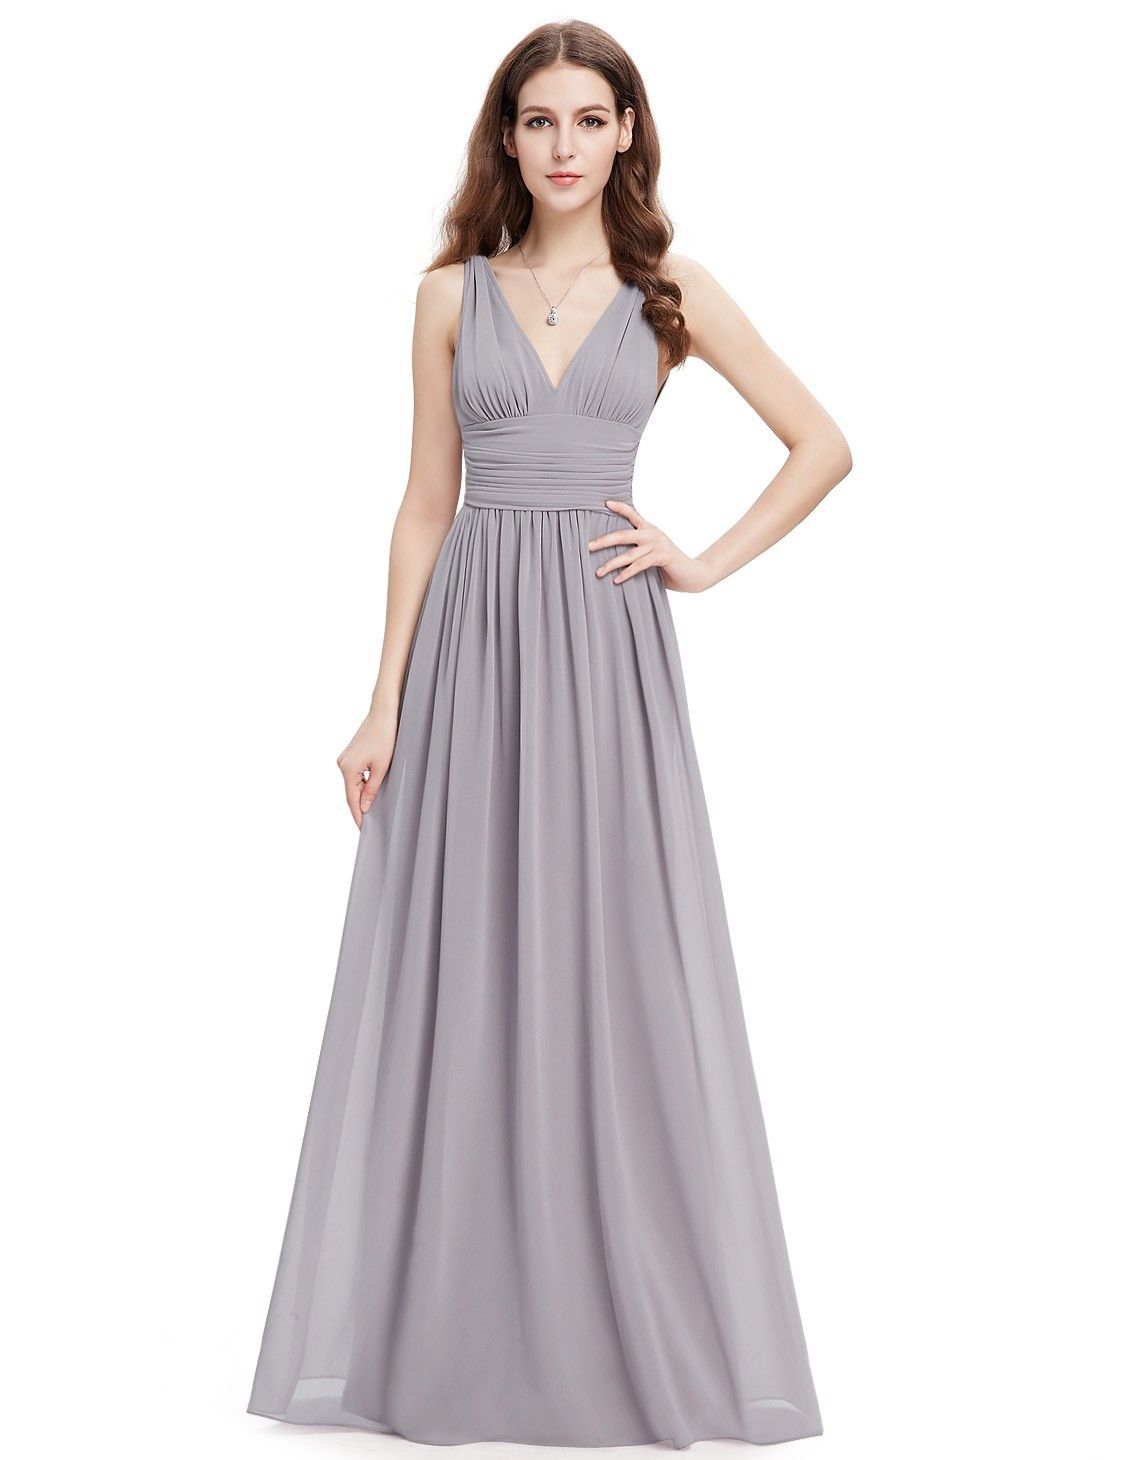 Sleeveless V-Neck Semi-Formal Maxi Dress in 2019  ce244ee543bf